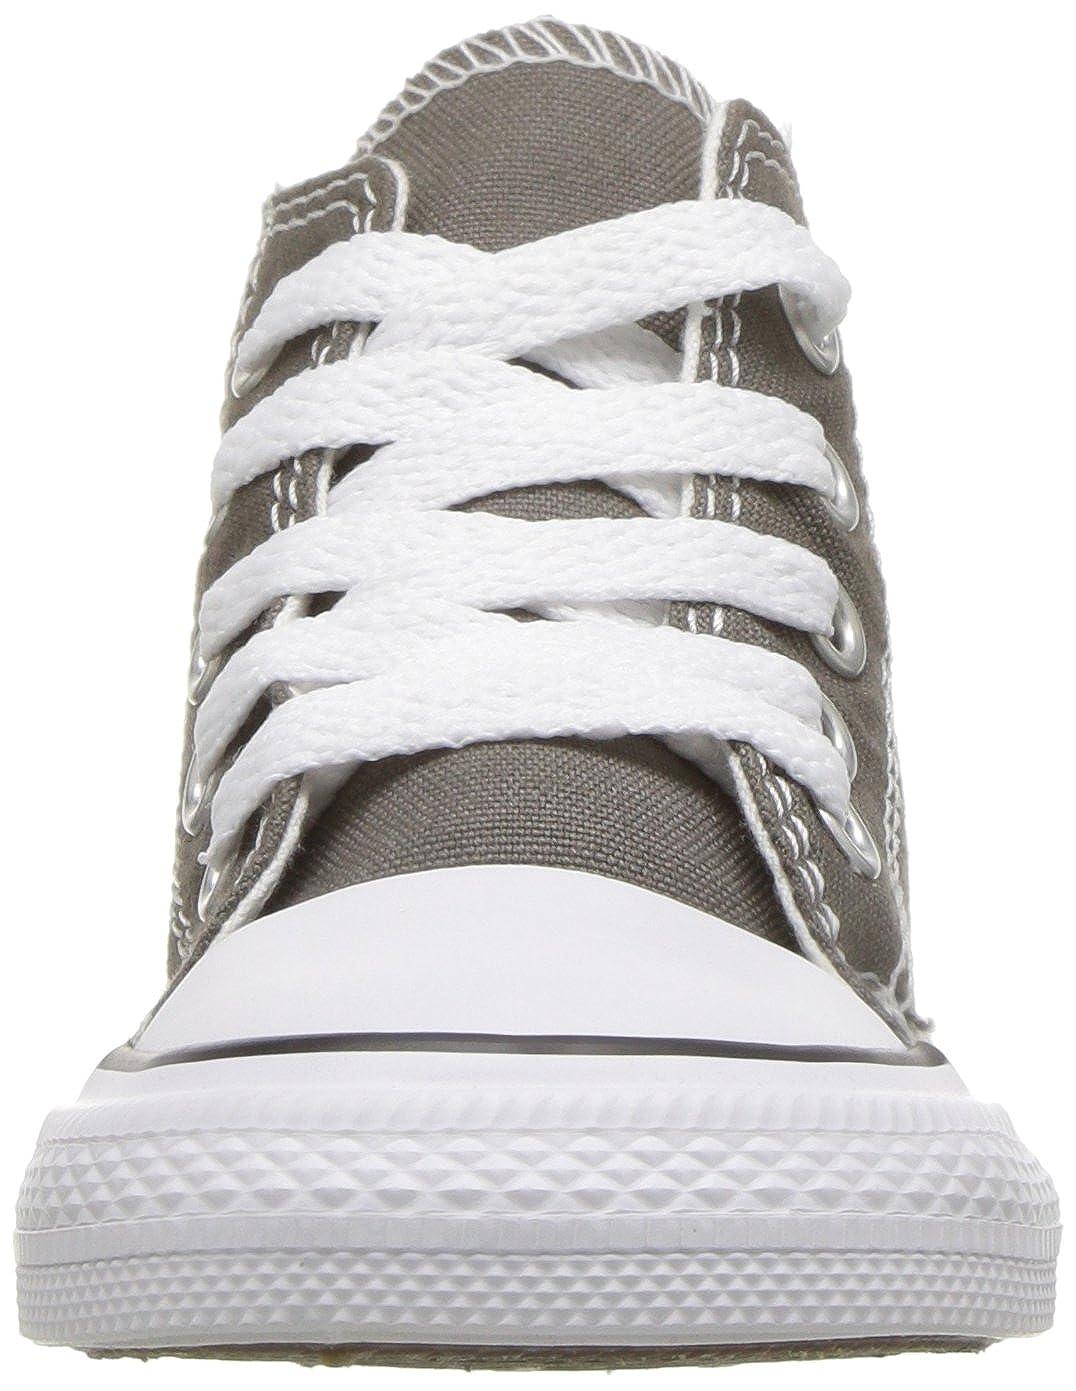 Converse Unisex-Kinder Chuck Taylor All Star Classic Colors f/ür Kleinkinder und Jugendliche Hohe Sneakers